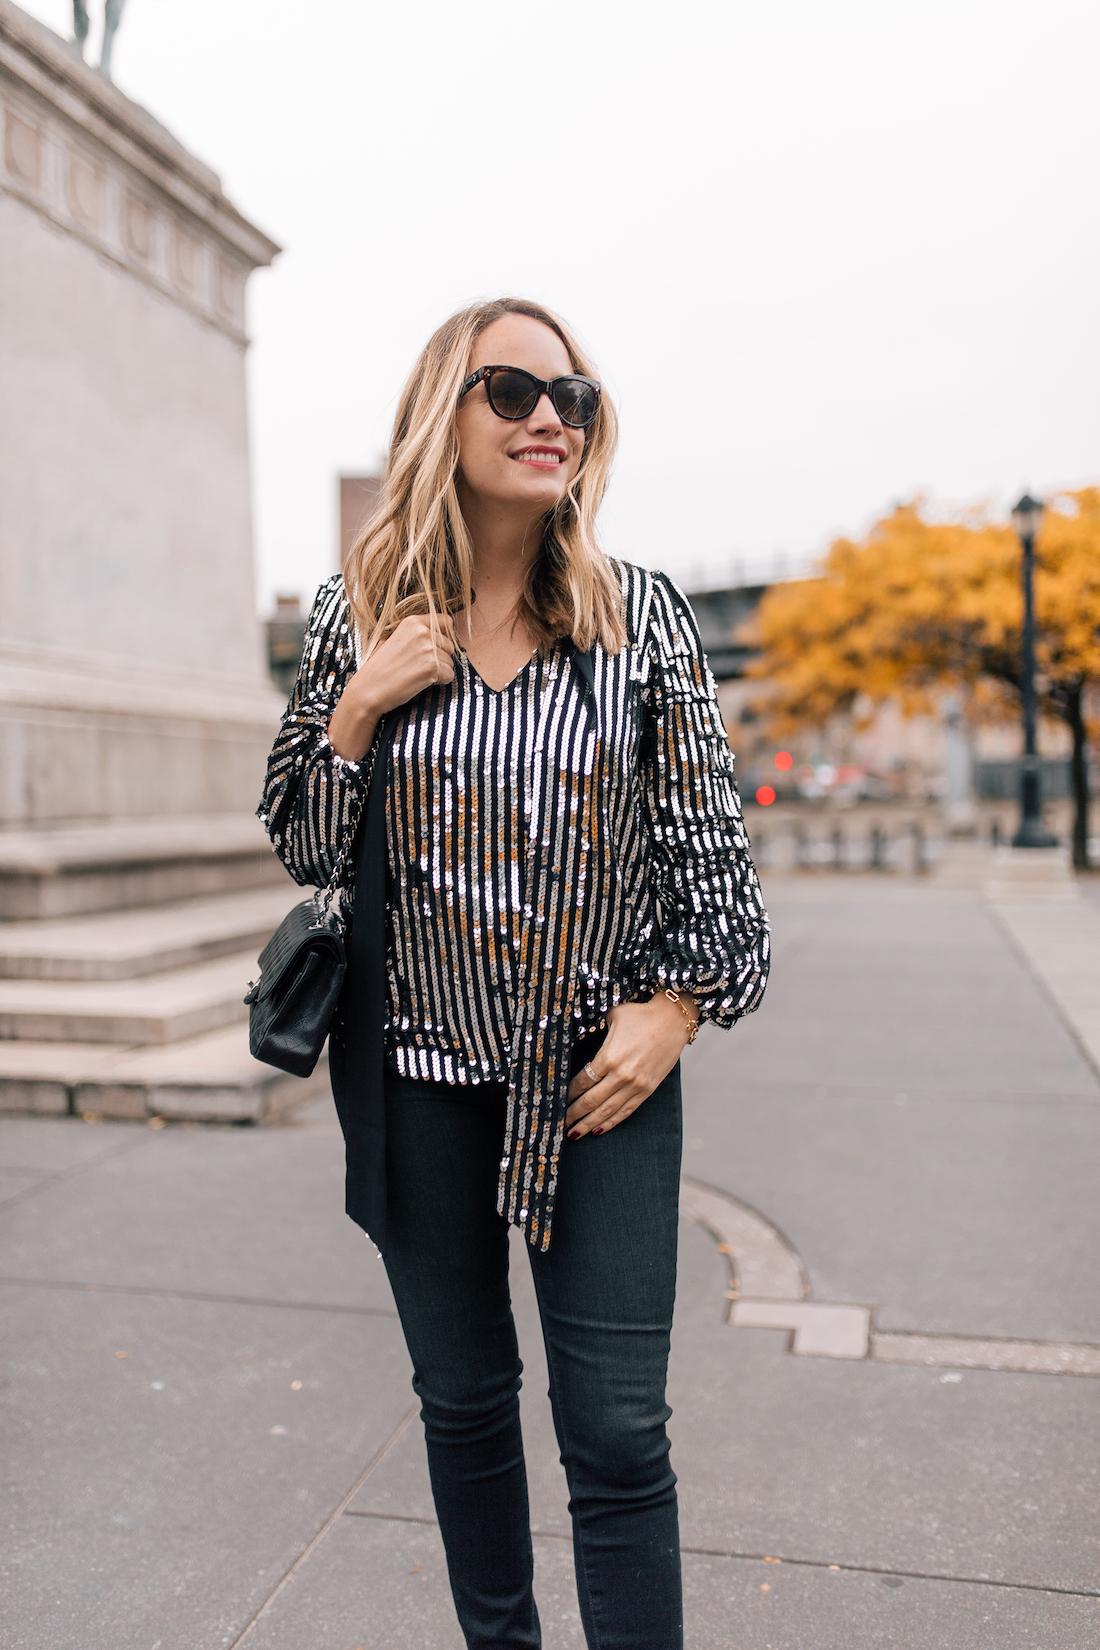 Outfit Details:Rixo London Sequin Top(size up!) //Paige Jeans //Polaroid Sunglasses